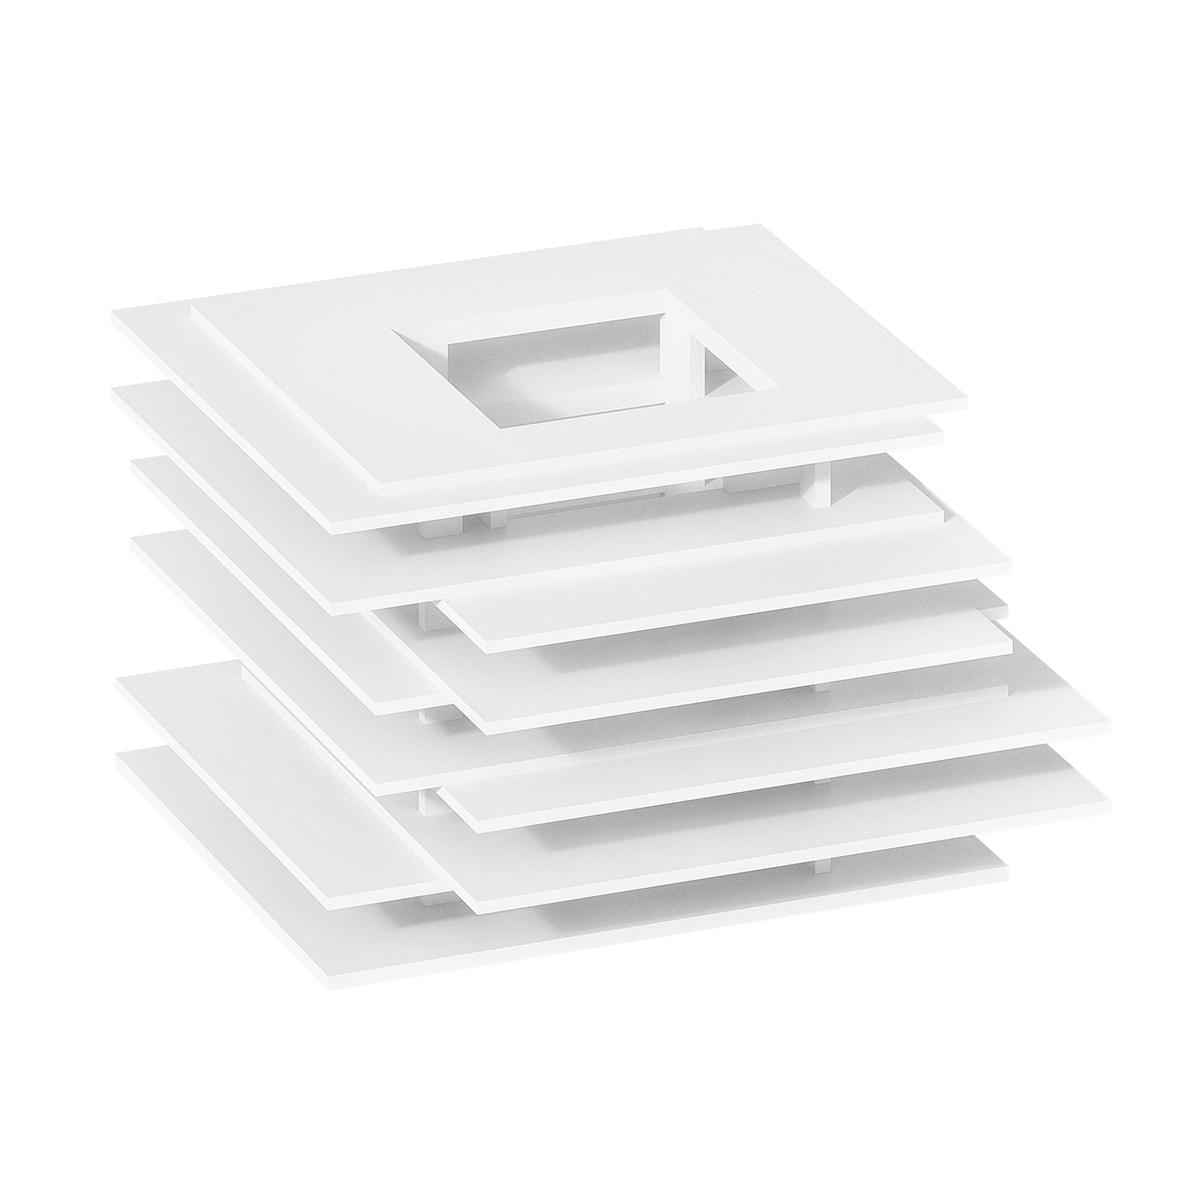 PDF_plates_03.jpg